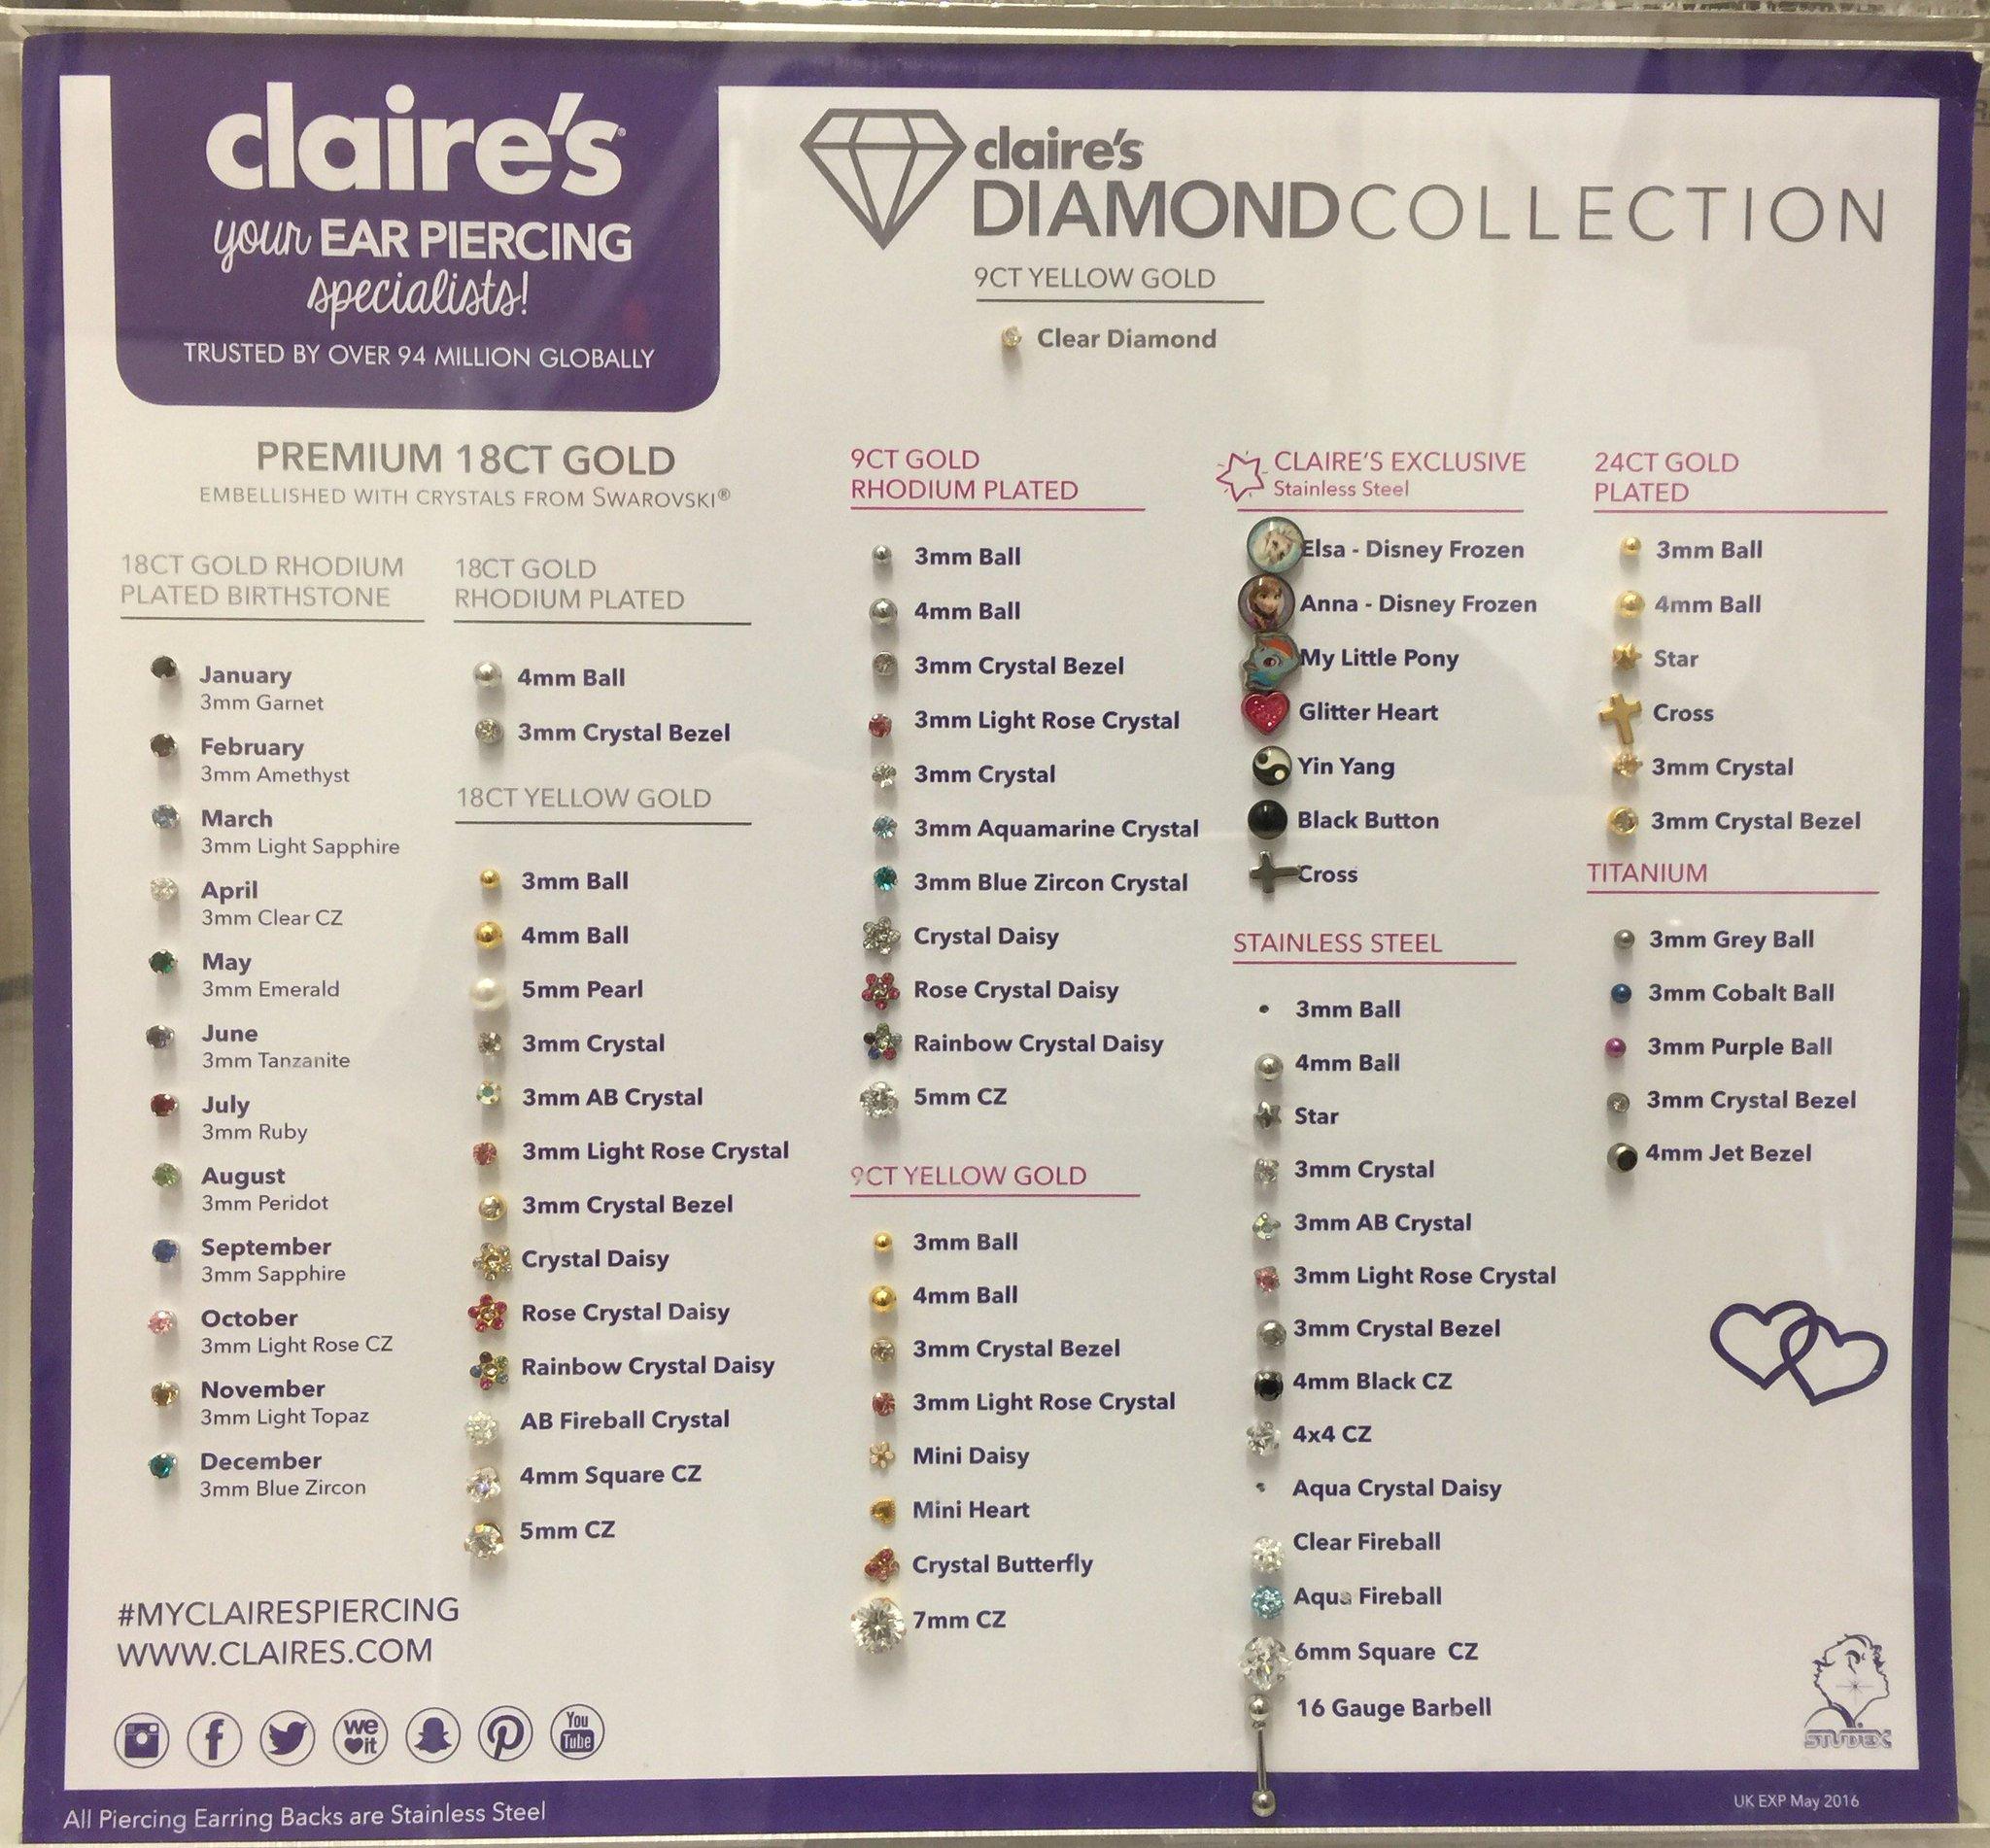 Shrewsbury Shopping On Twitter Hello Jewellery Addicts Visit